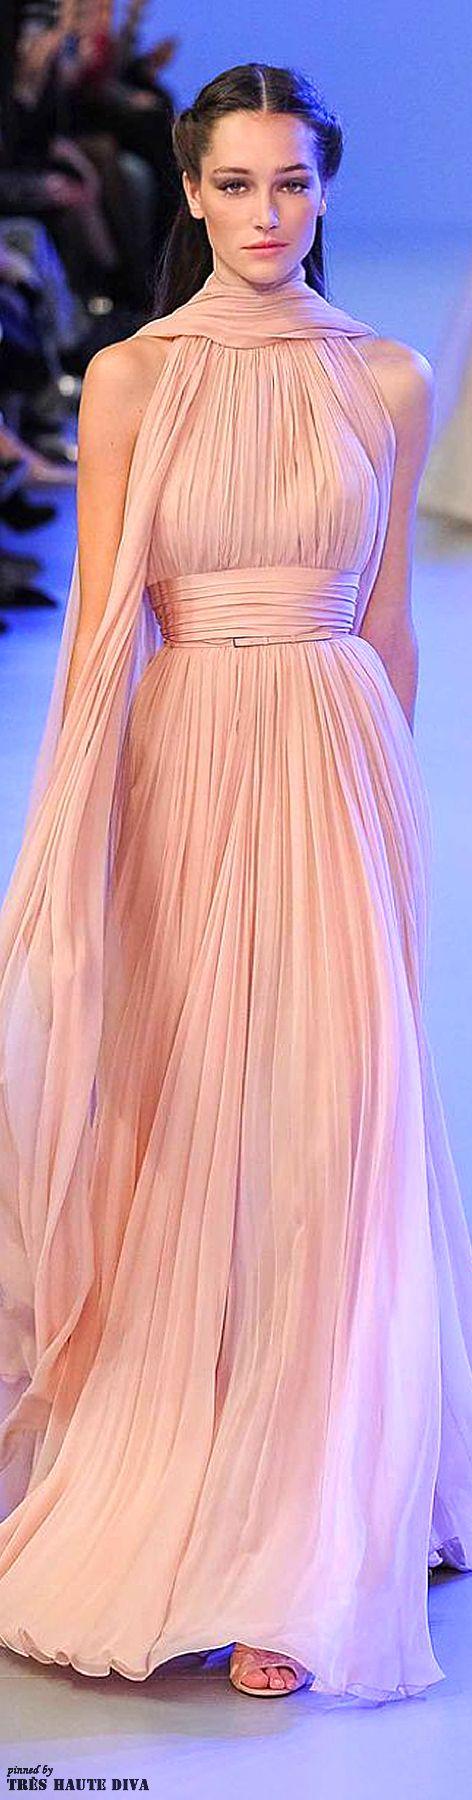 Elie Saab Spring 2014 Couture | Keep The Glamour, ~LadyLuxury~ [[I ...